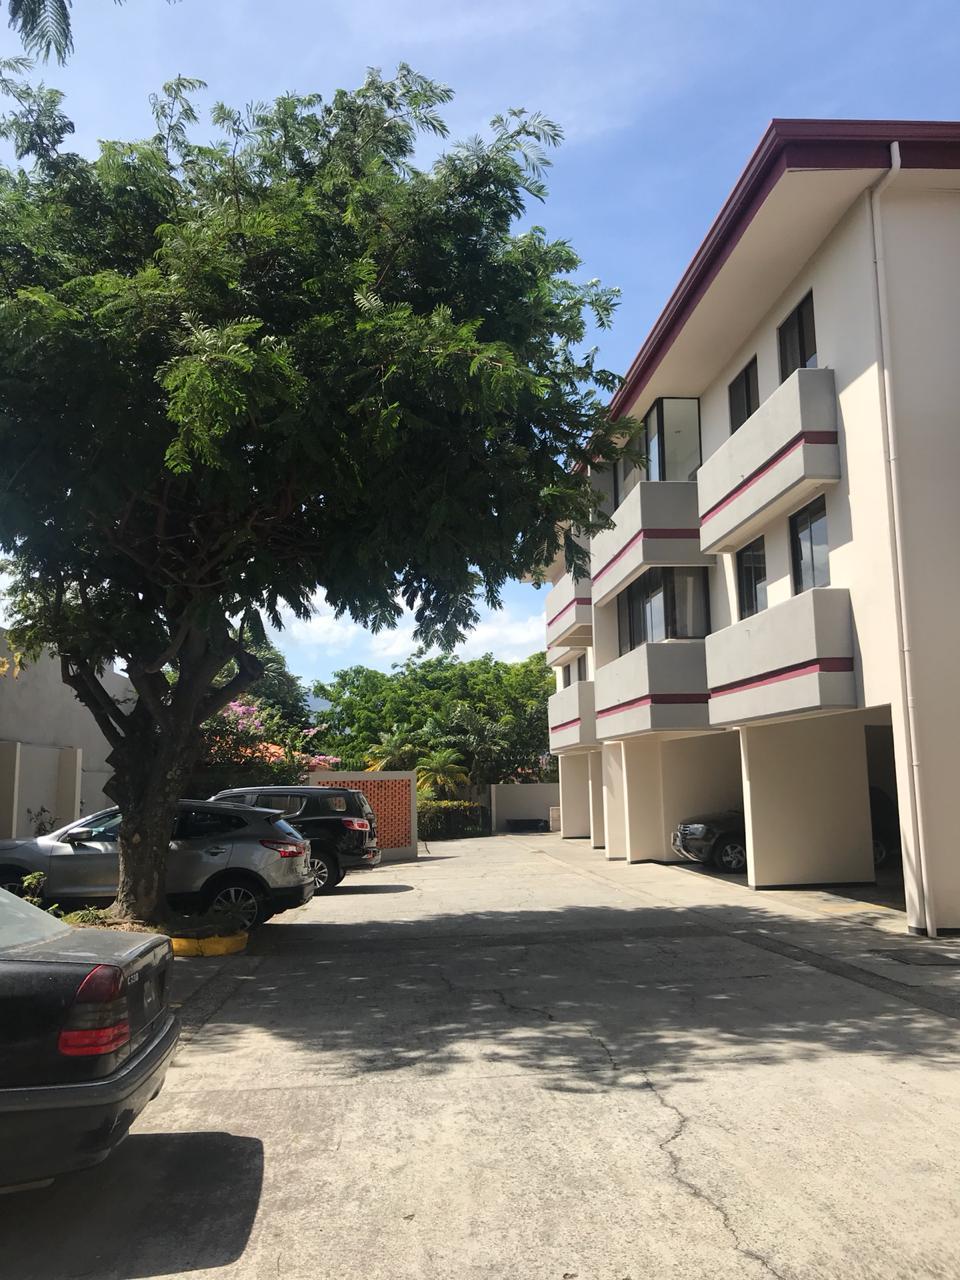 #2201 Alquilo apartamento cerca del Hospital México